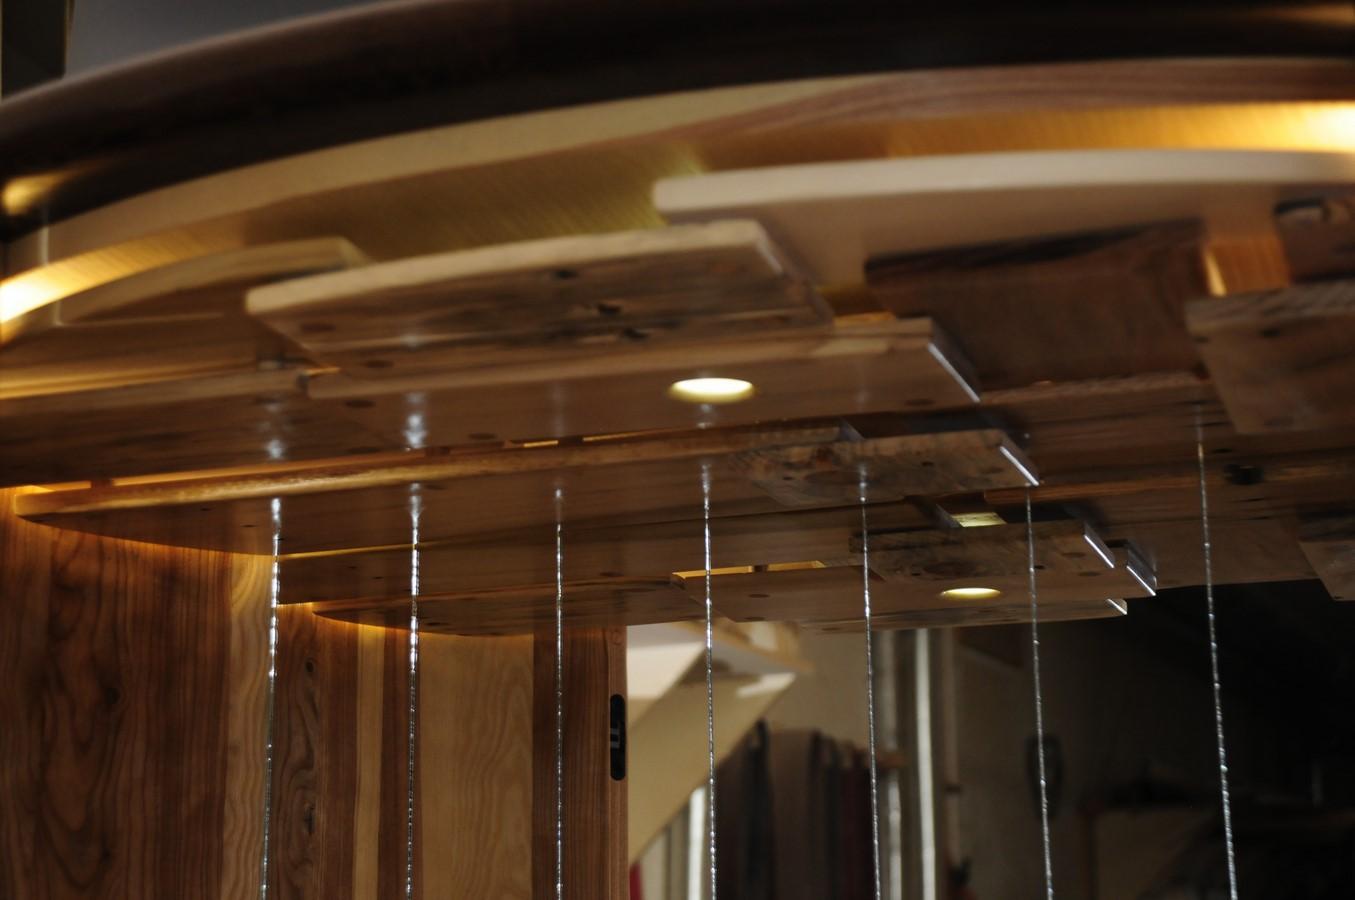 Interior - using pallet material & subtle lighting